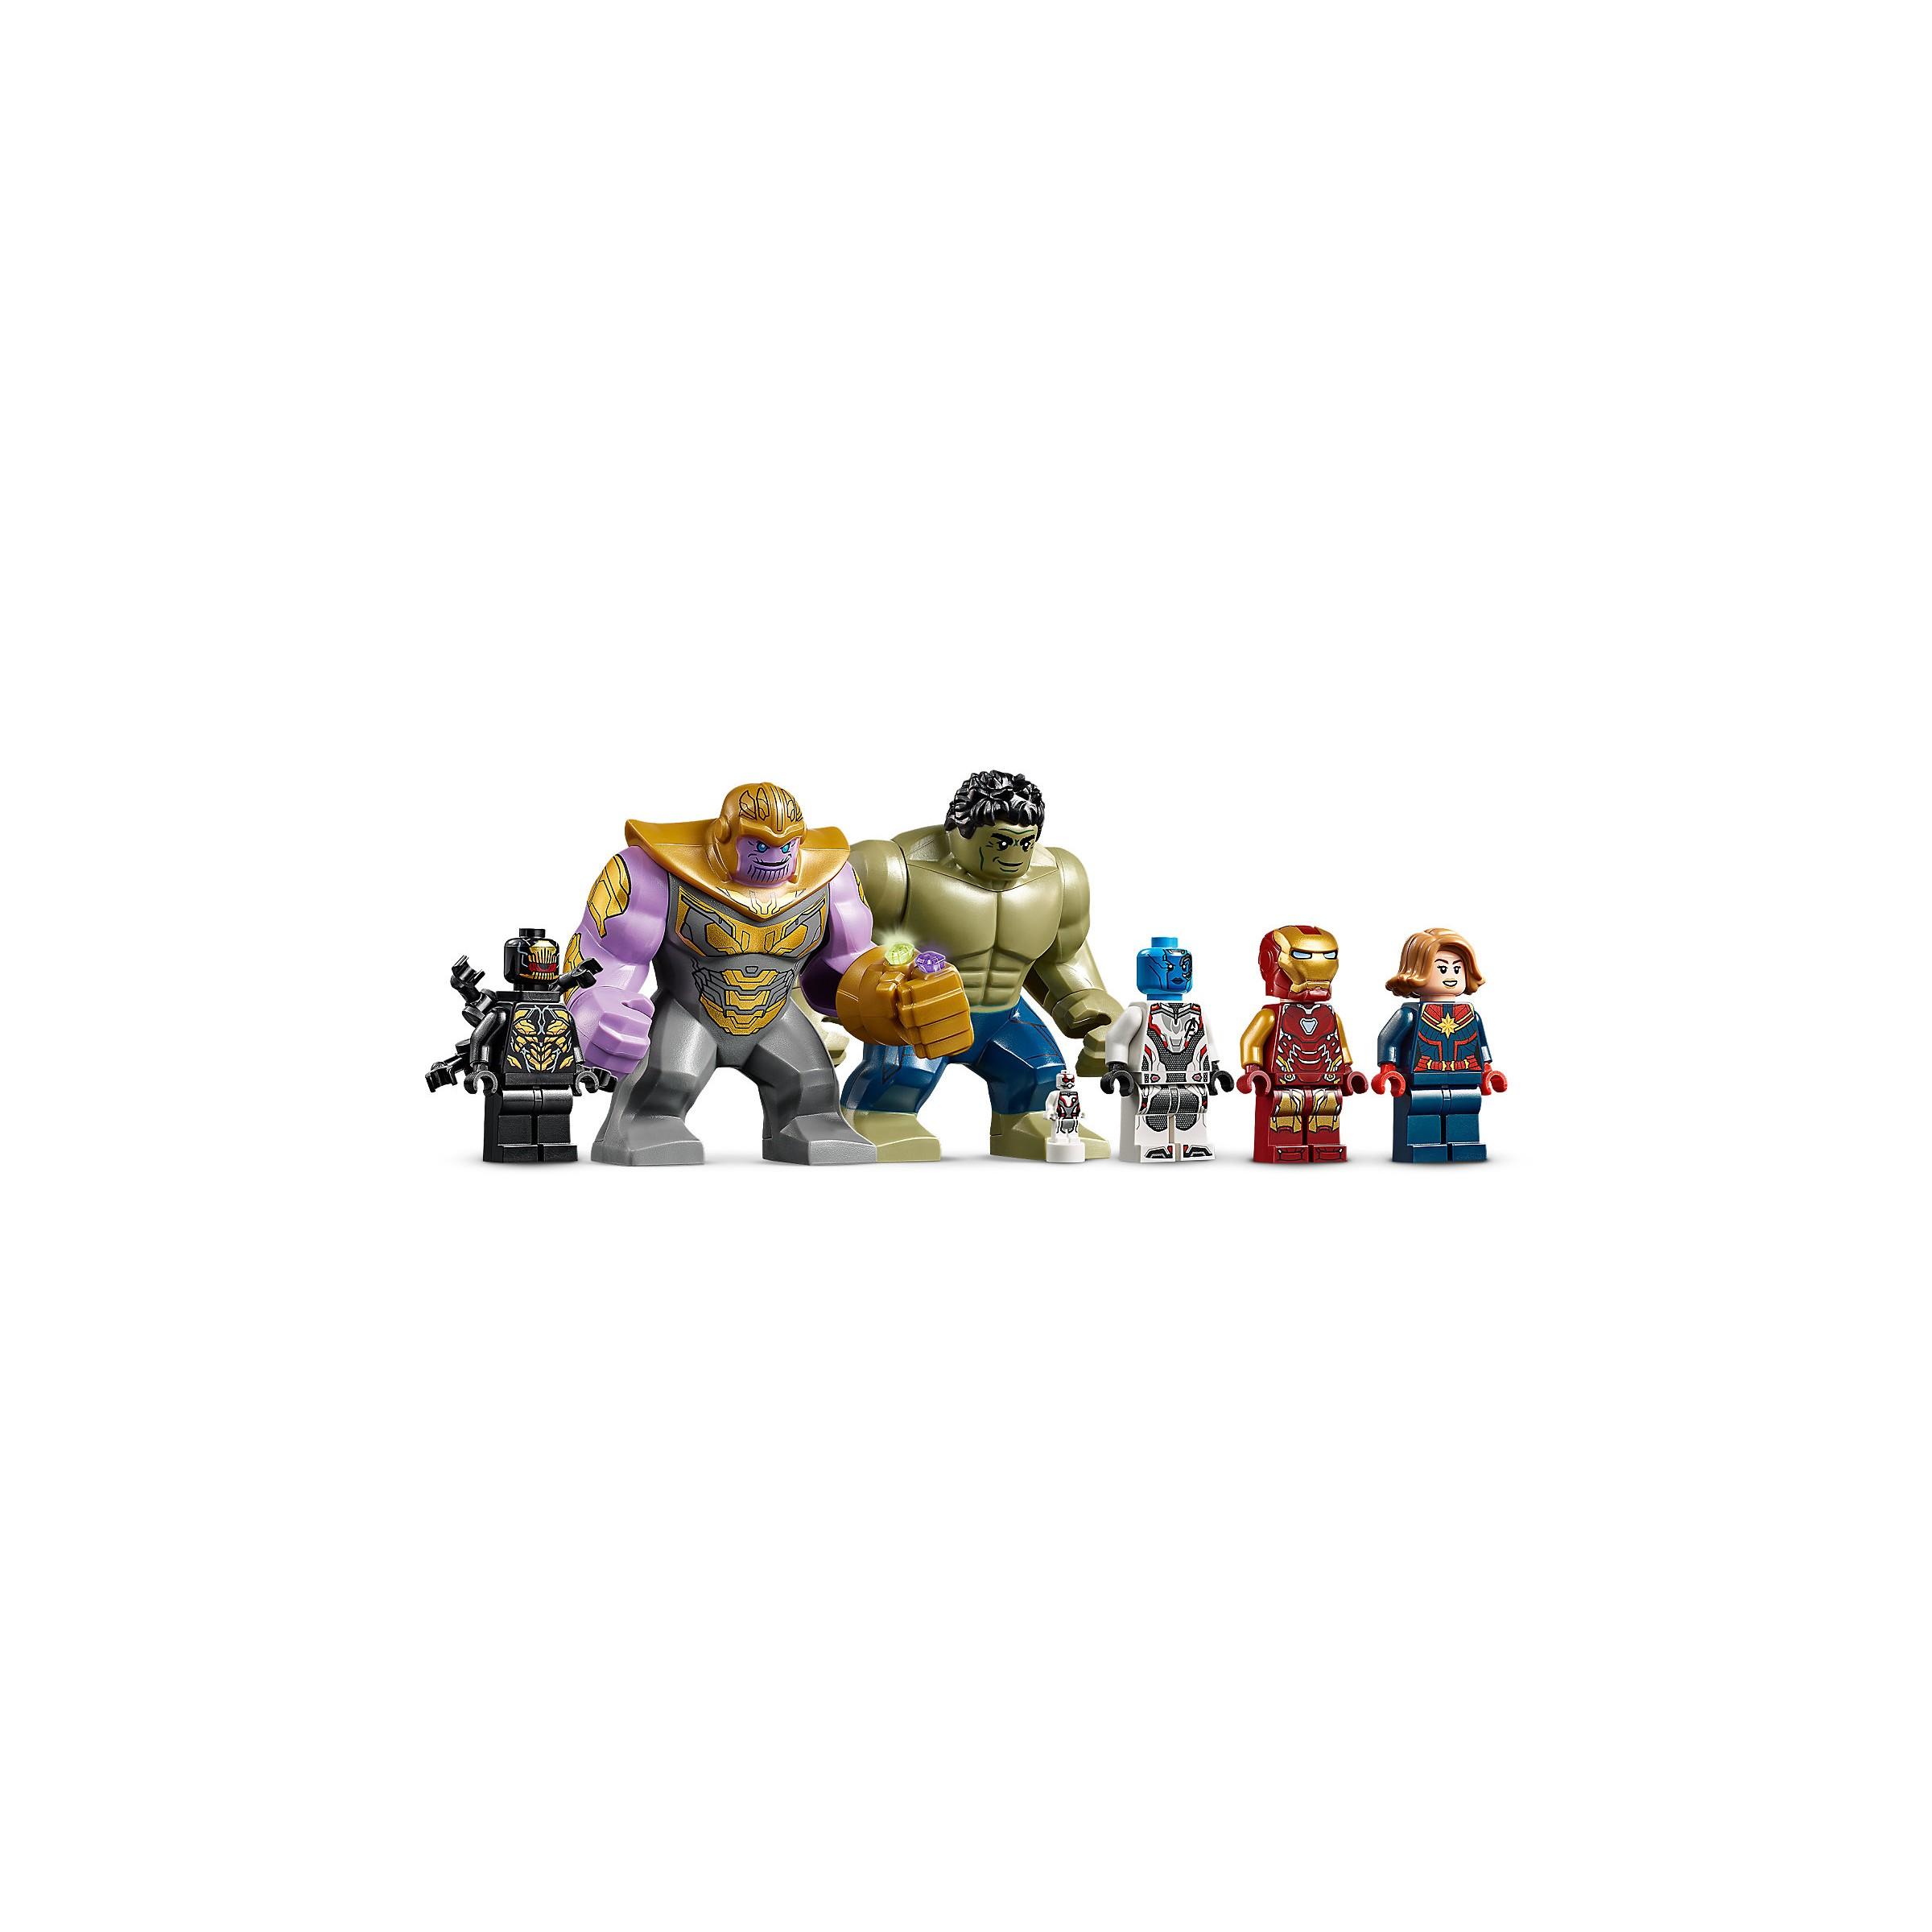 LEGO 76131 MARVEL AVENGERS ENDGAME ANTMAN MICROFIGURE minifigure compound battle